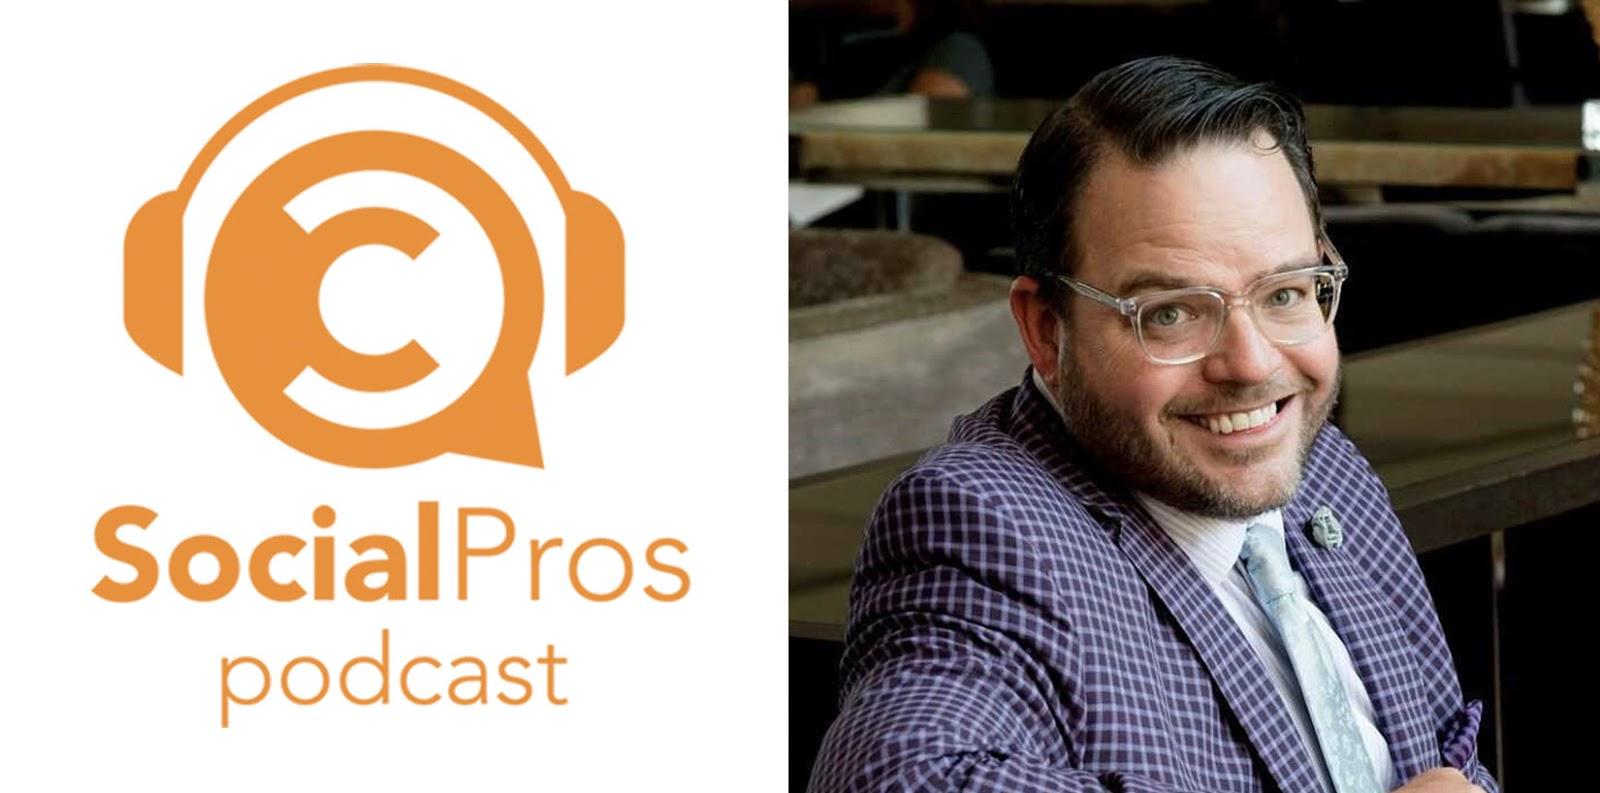 podcast social pros